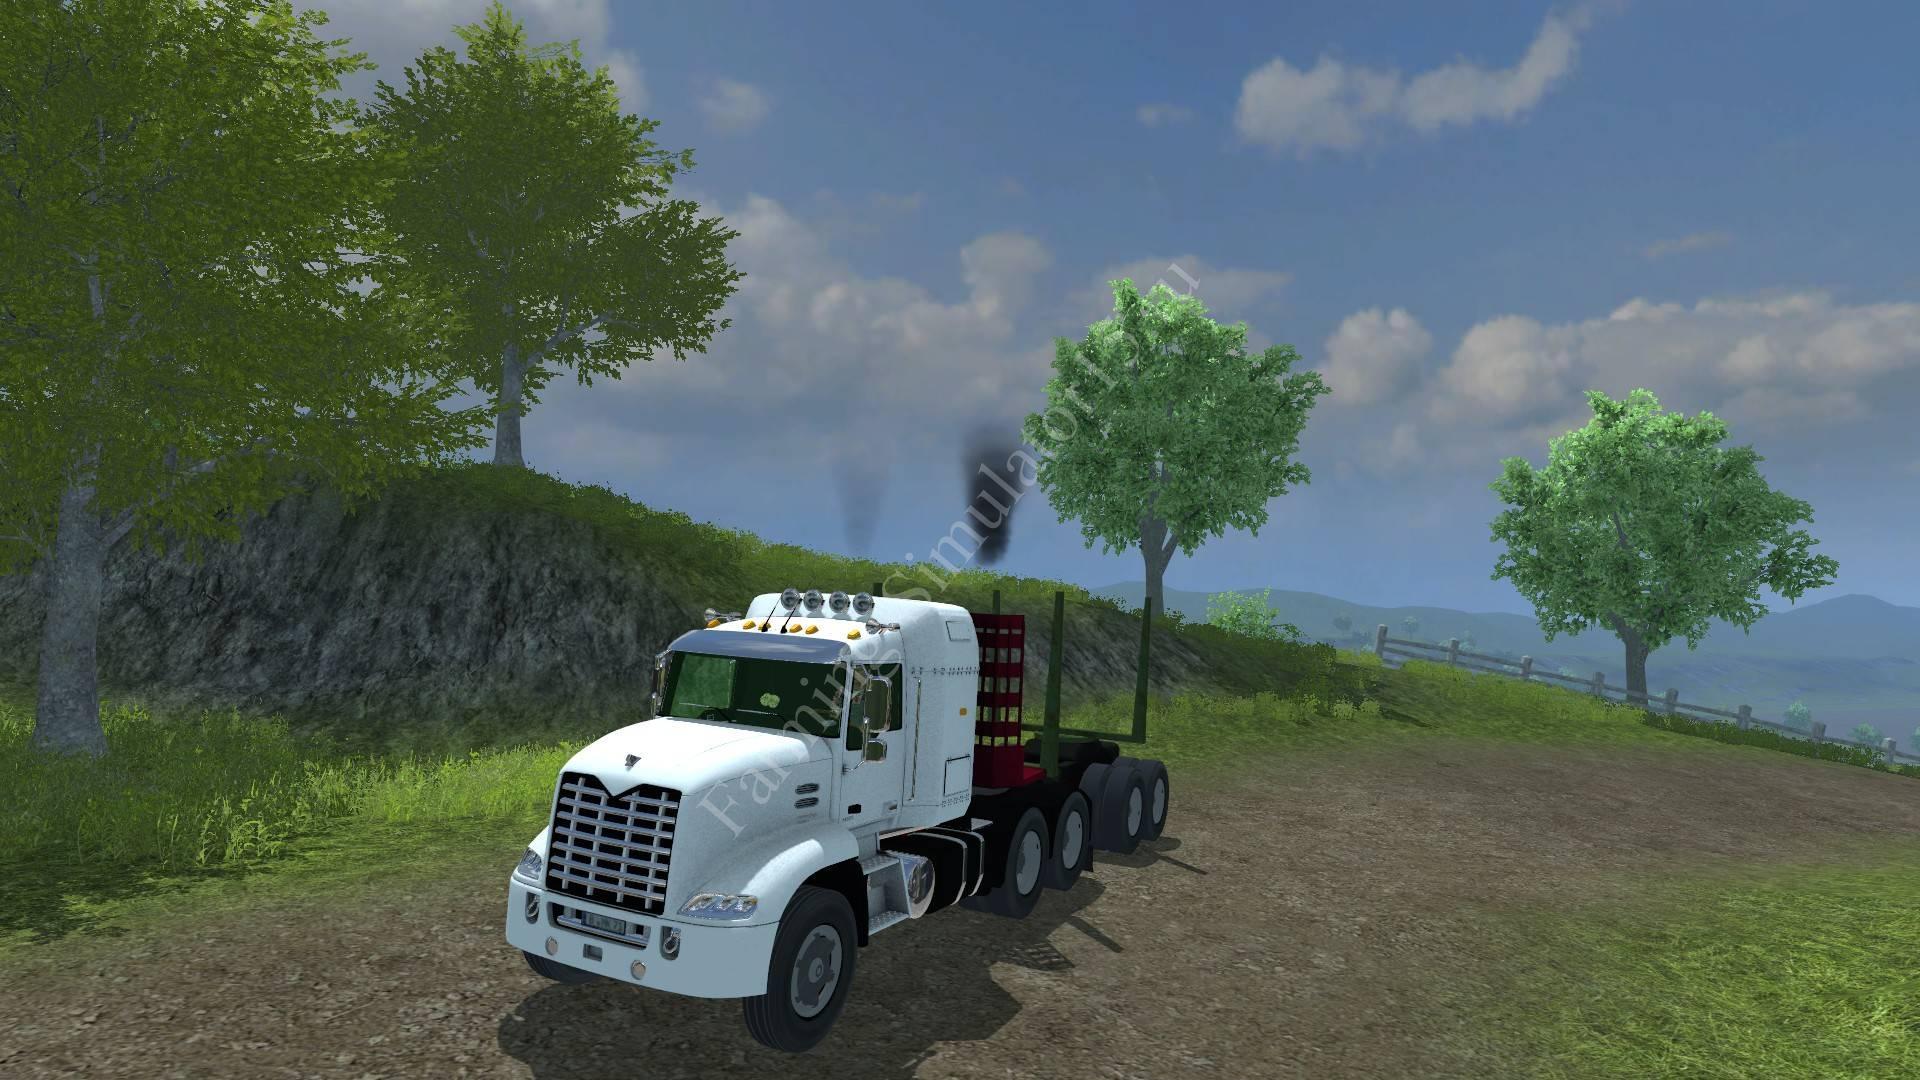 Мод грузовика Mack 803 Forest v 1.0 Farming Simulator 2013, Farming Simulator 13